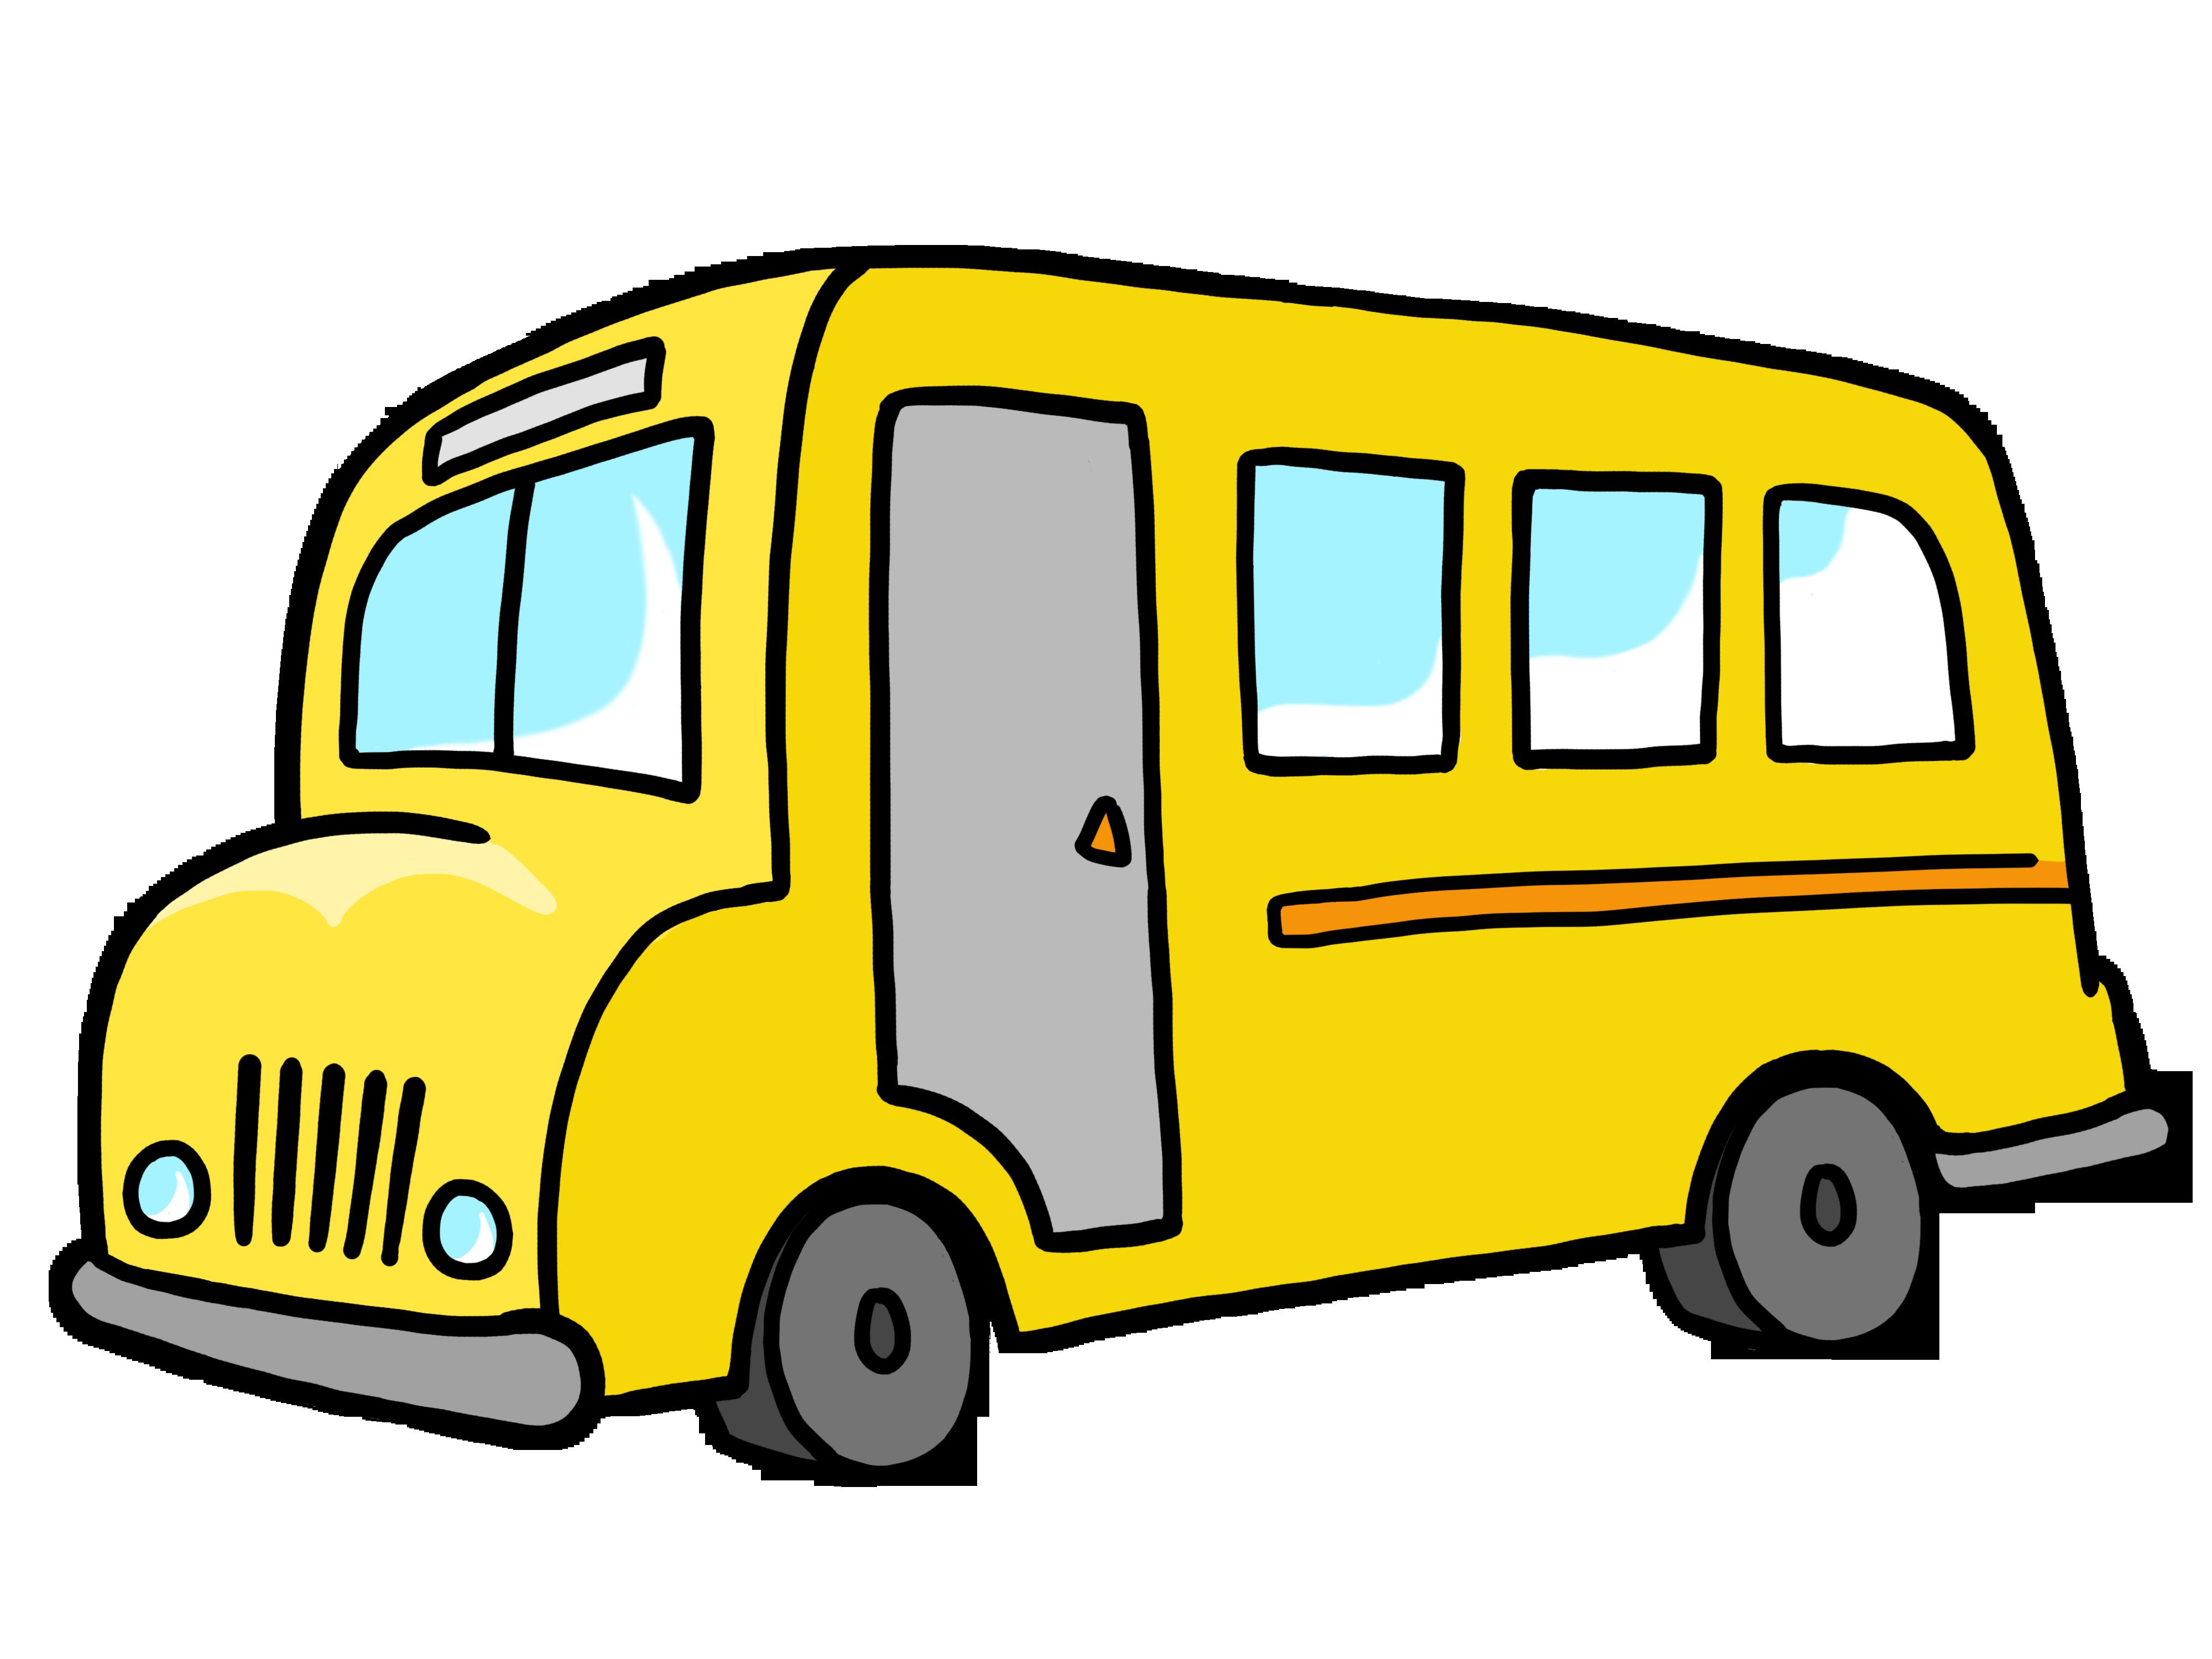 School bus simple bus clip art free clipart images pluspng - City Bus Side View PNG